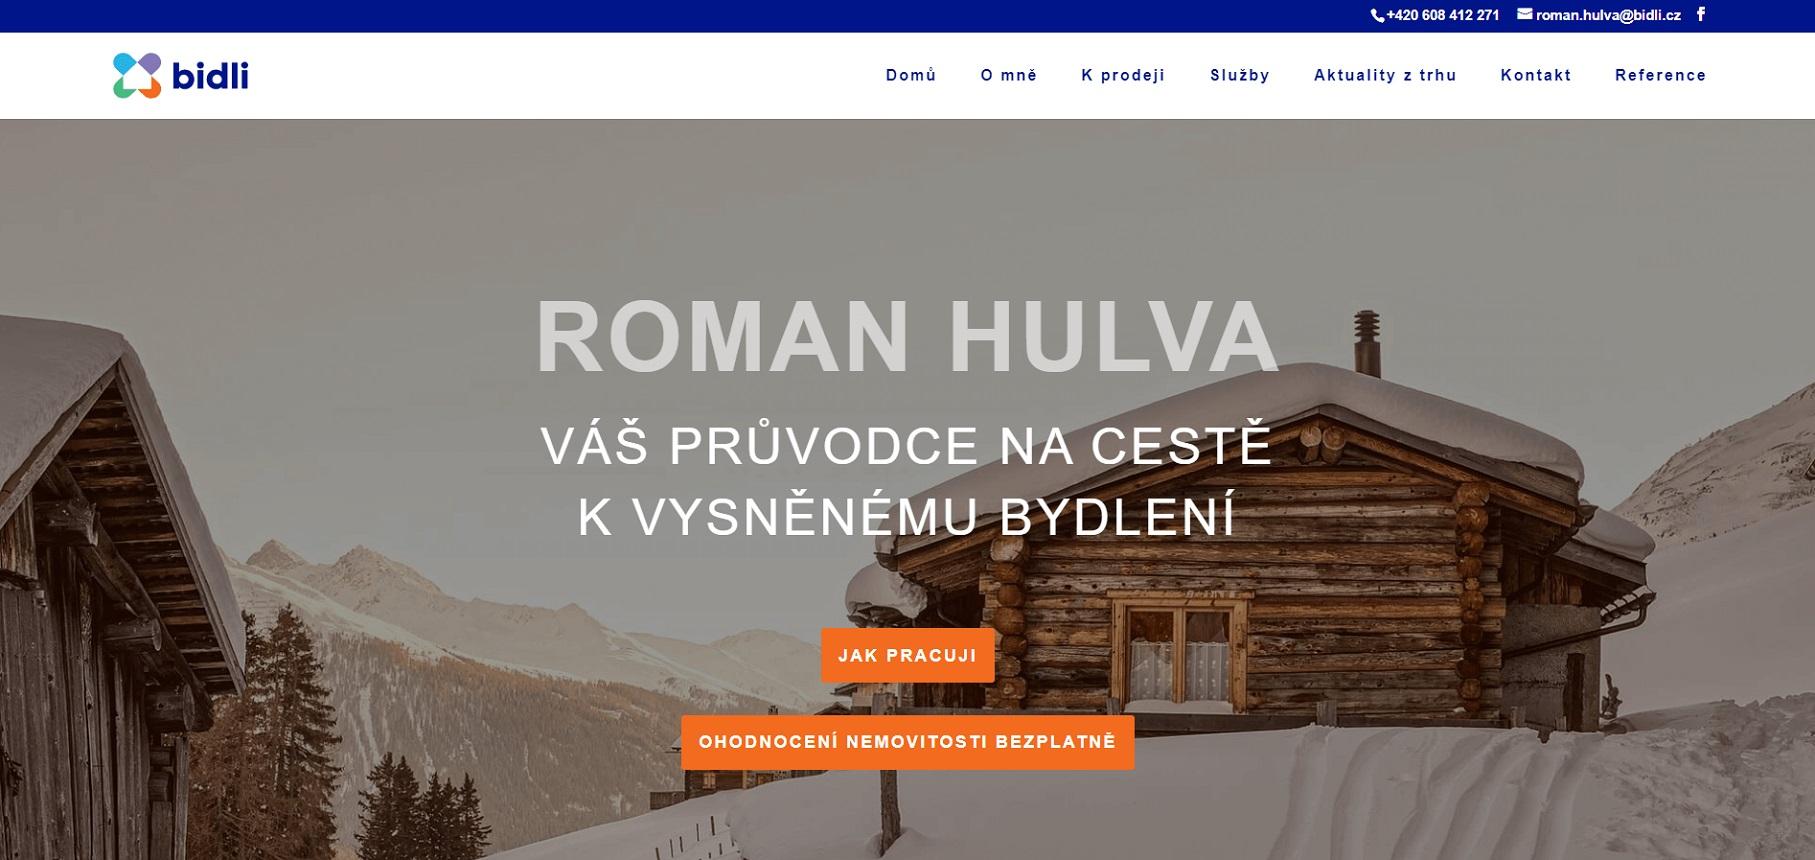 Roman Hulva